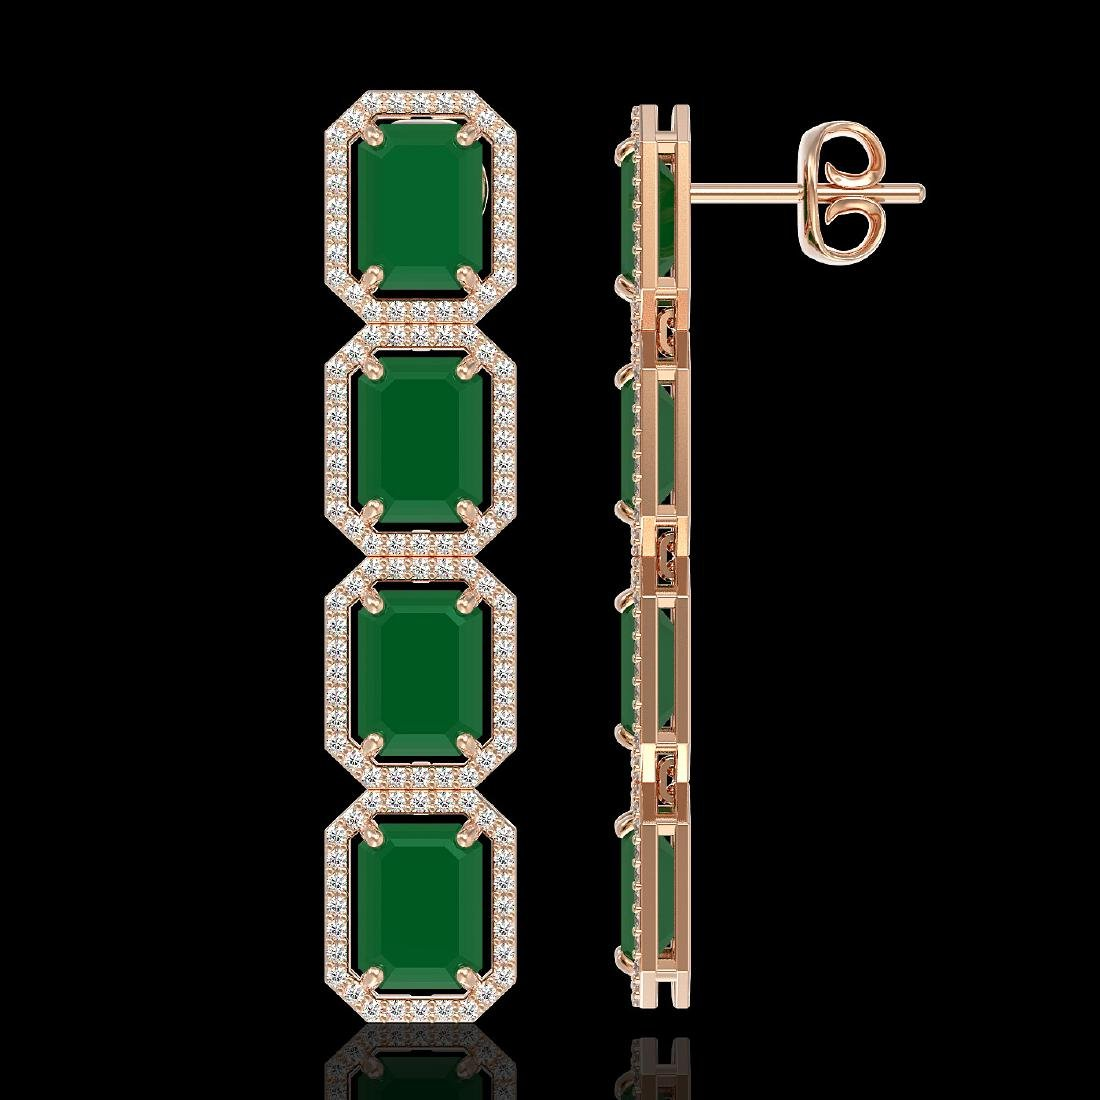 20.59 CTW Emerald & Diamond Halo Earrings 10K Rose Gold - 2